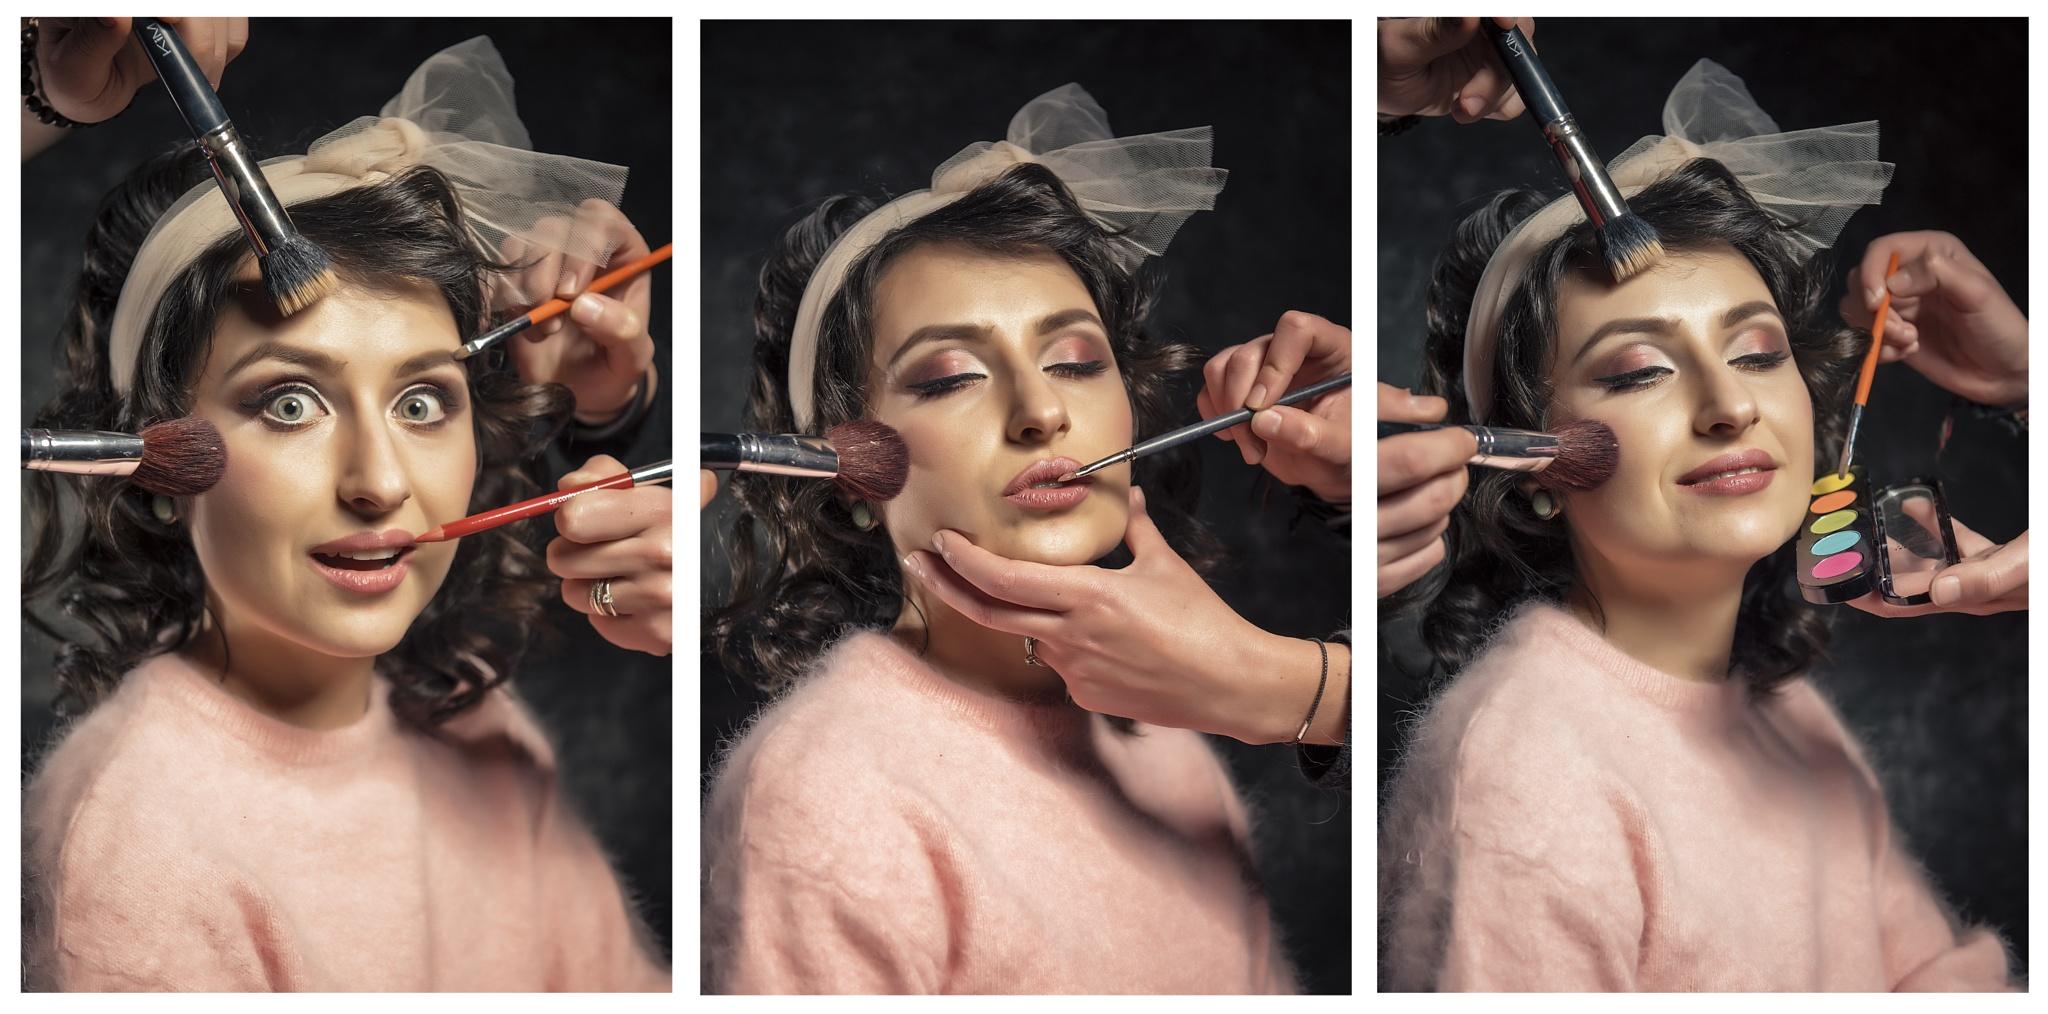 The make-up storyline by Bogdan Iacob